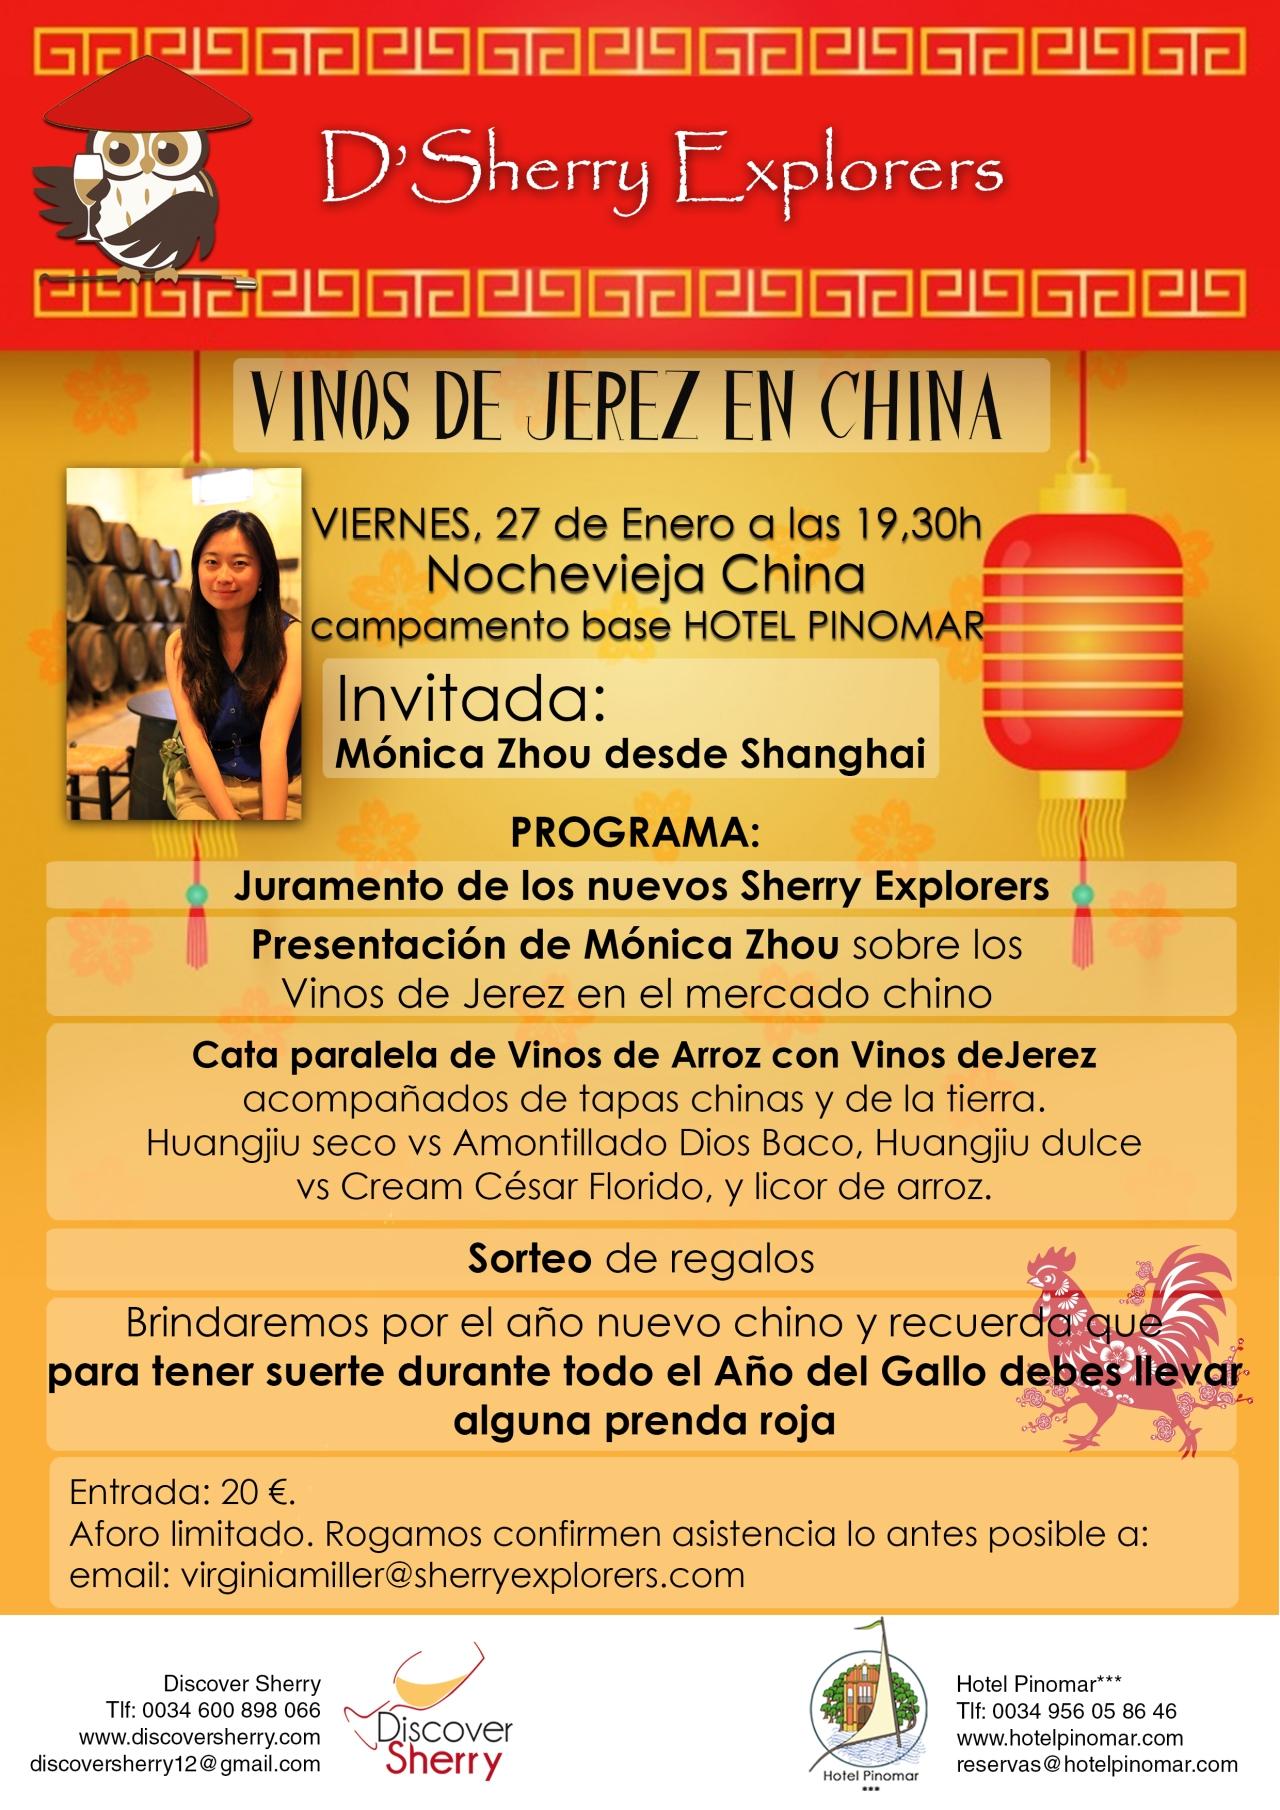 Mónica Zhou invitada a la reunión de los Sherry Explorers en la nochevieja china / Mónica Zhou will be D´Sherry Explorers´ guest on Chinese New Year´seve